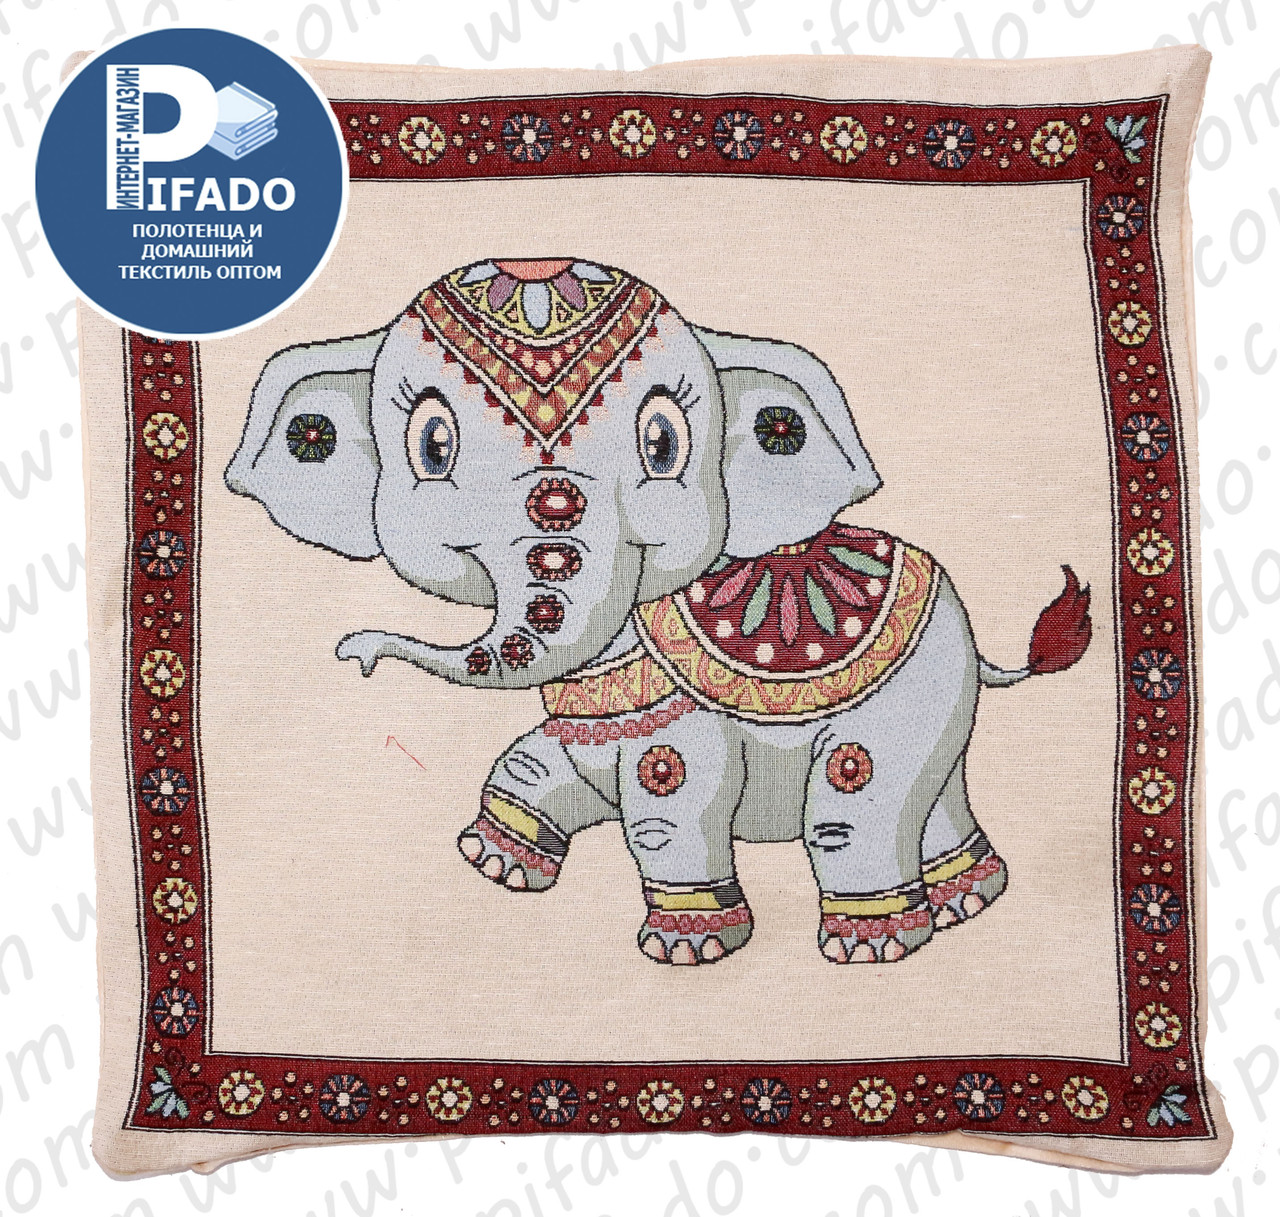 Декоративная наволочка с вышивкой слон (гобелен) 50х50. Модель HD01-15